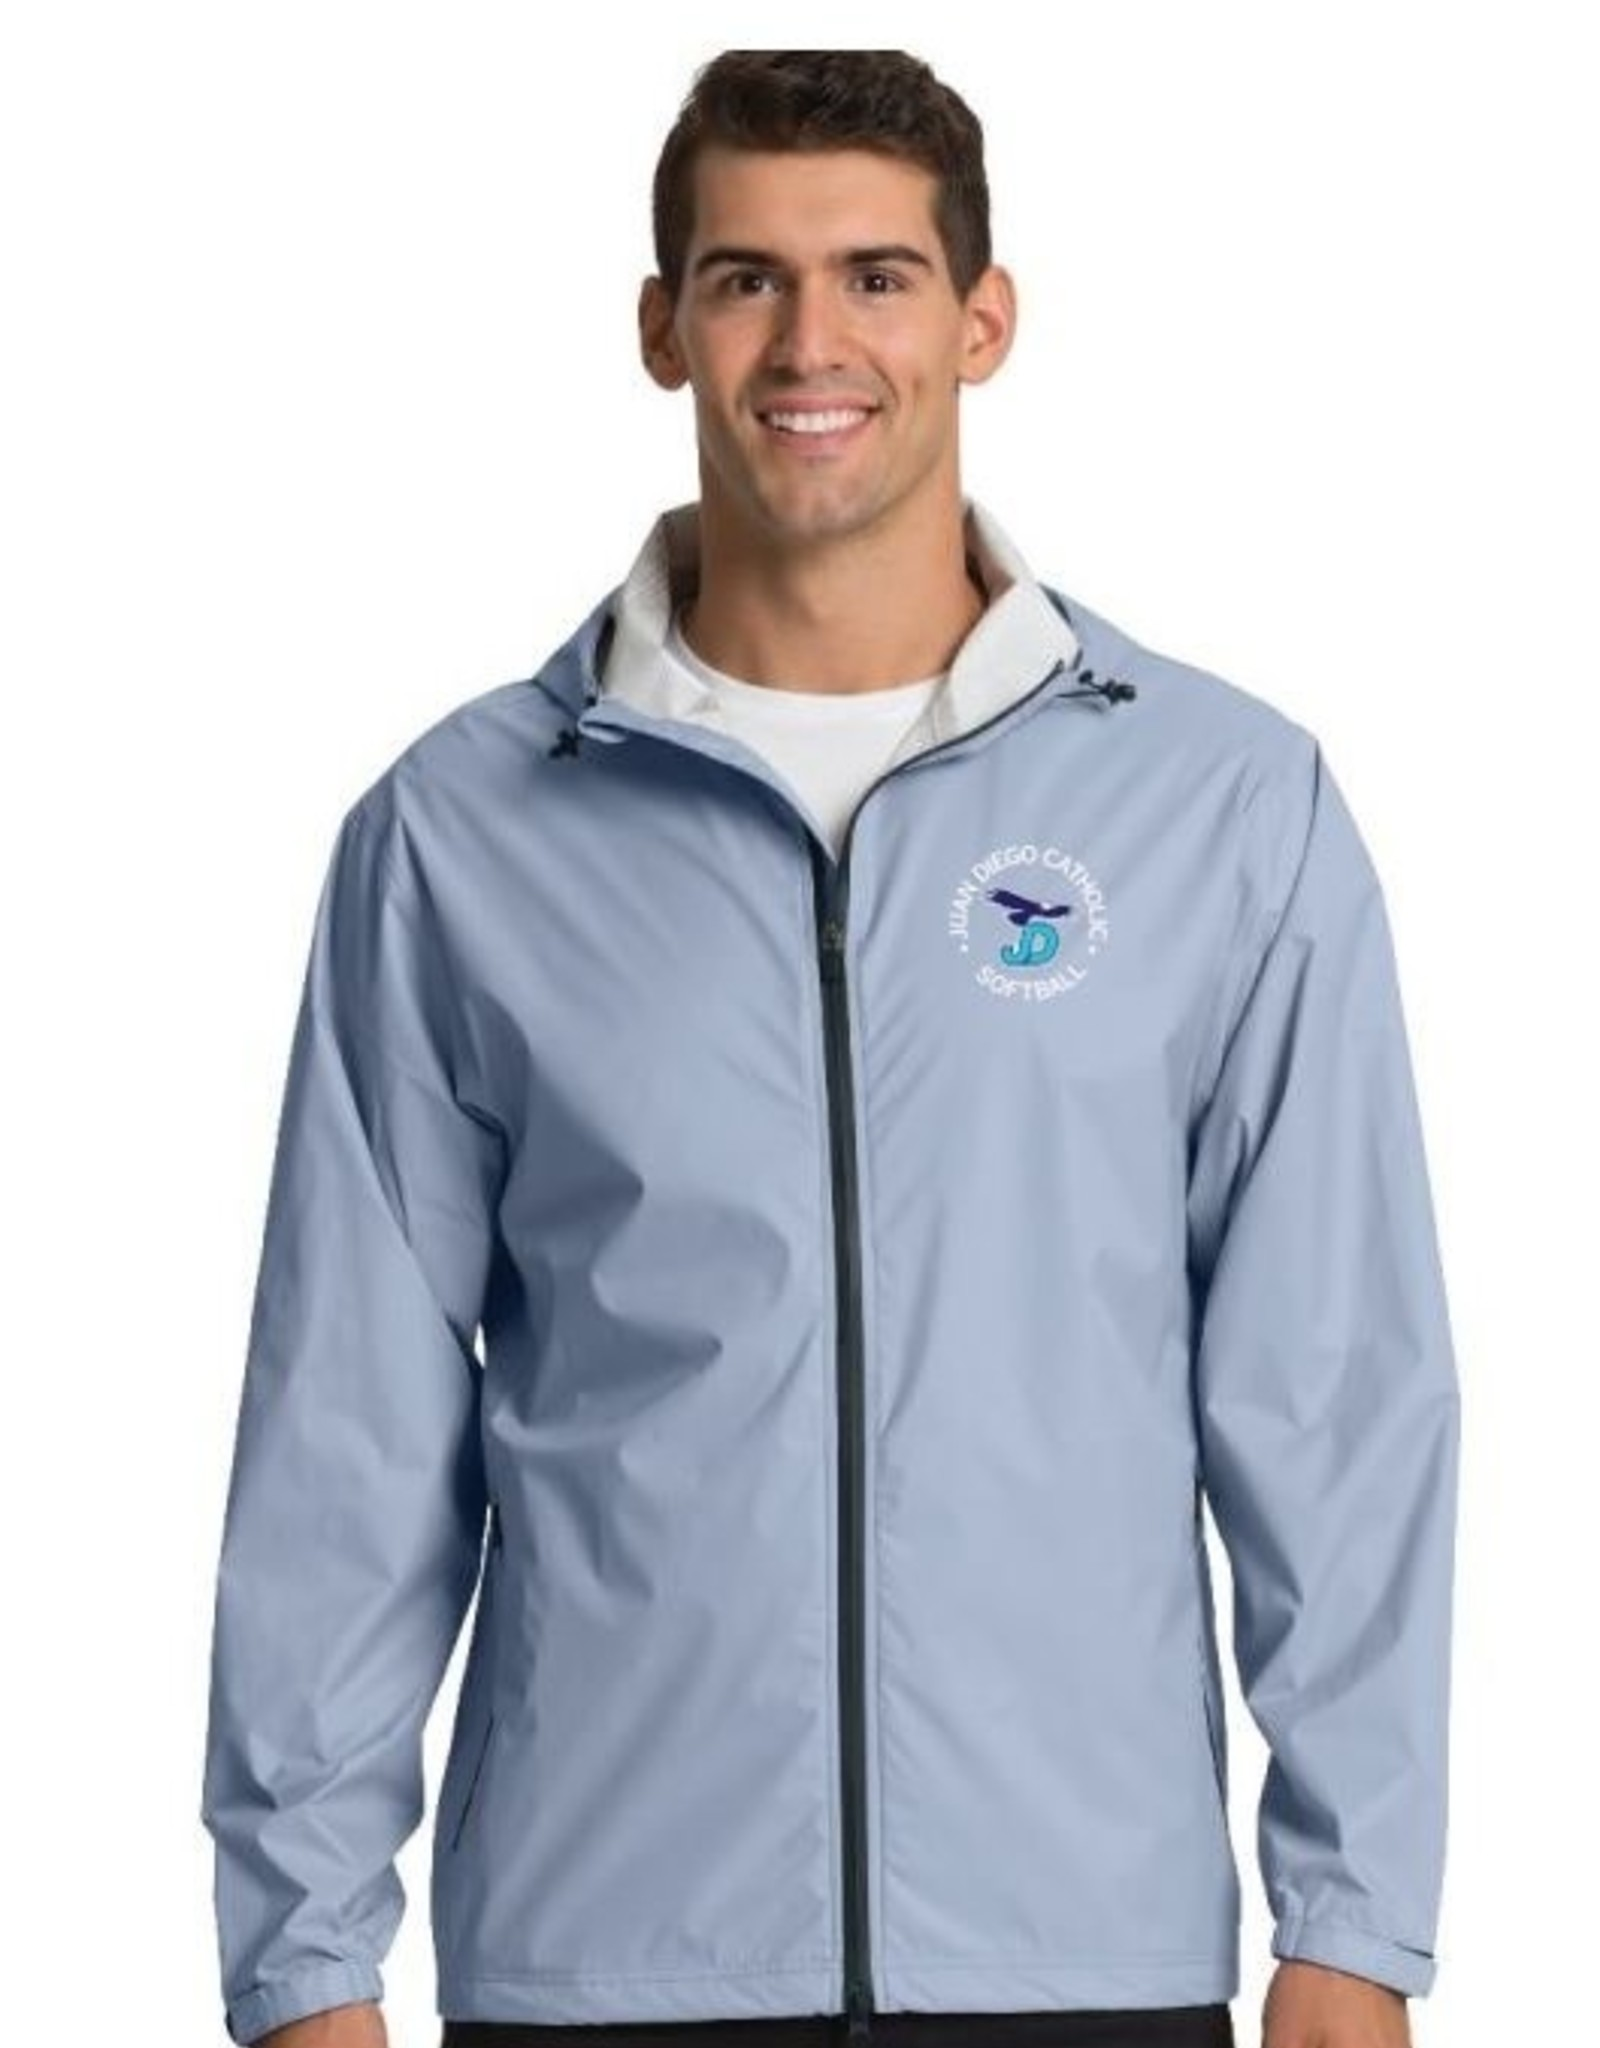 NON-UNIFORM 2018 Softball  UNISEX Embroidered Watertown Jacket